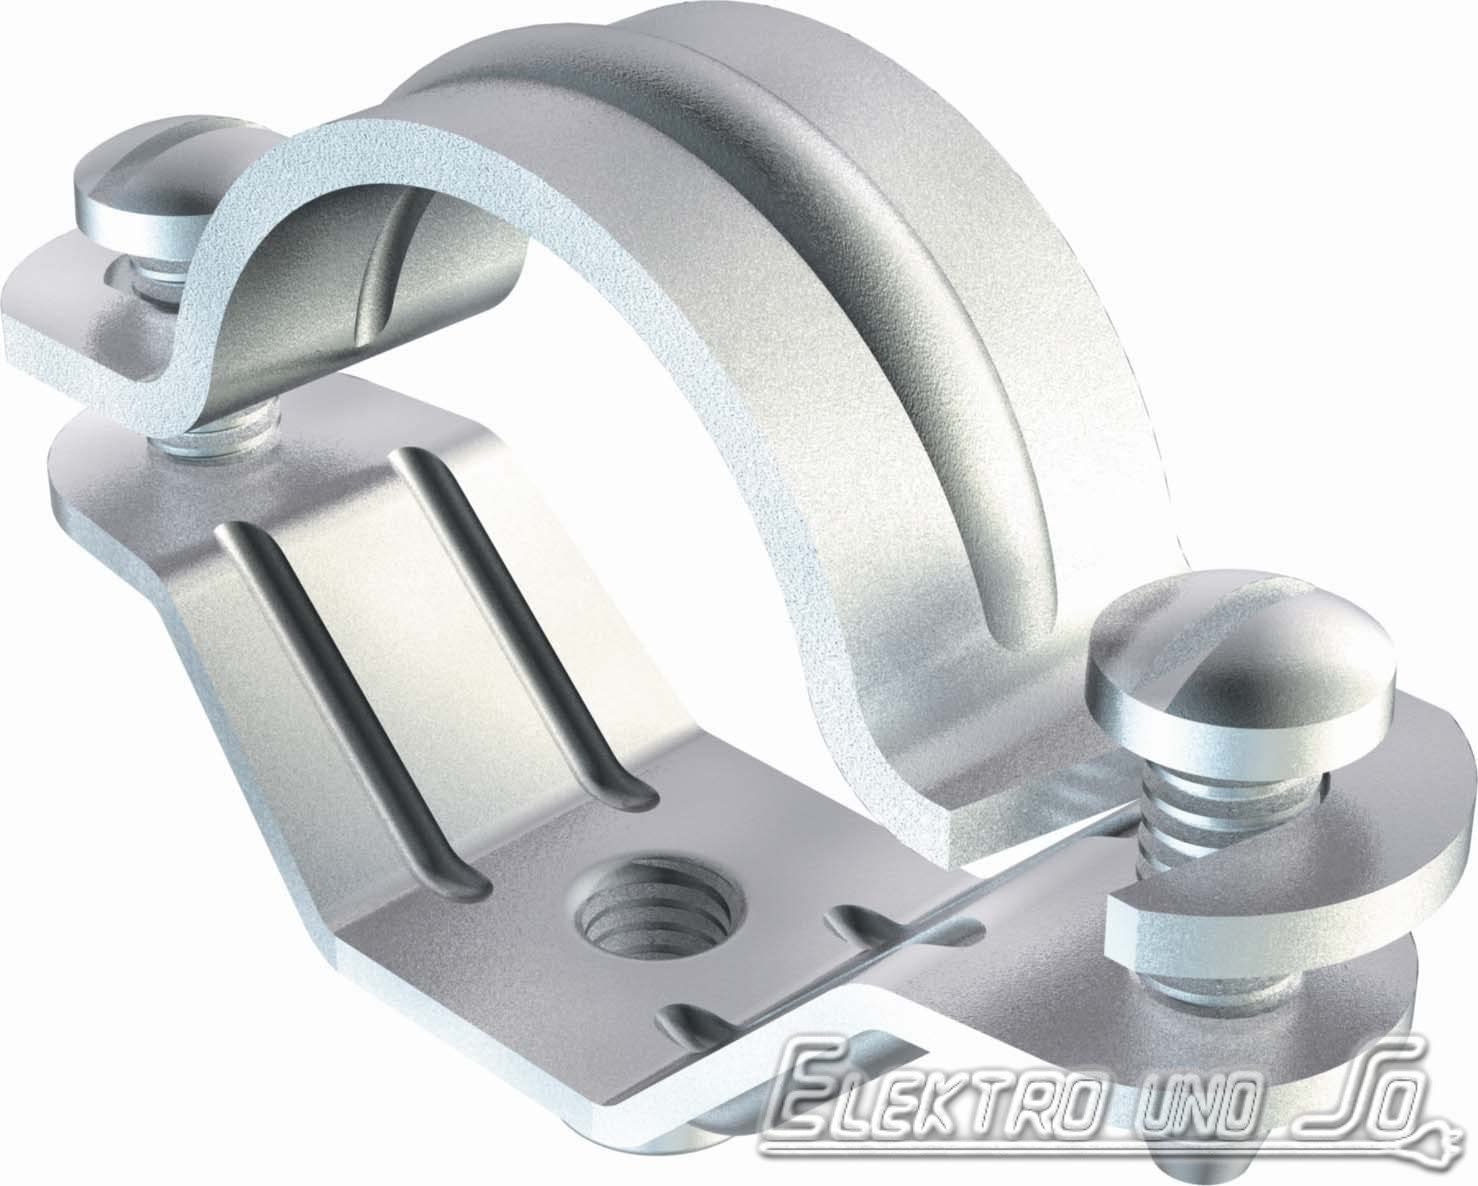 16/mm obo-bettermann System Conex /grapaa Druck 6 FIJ./